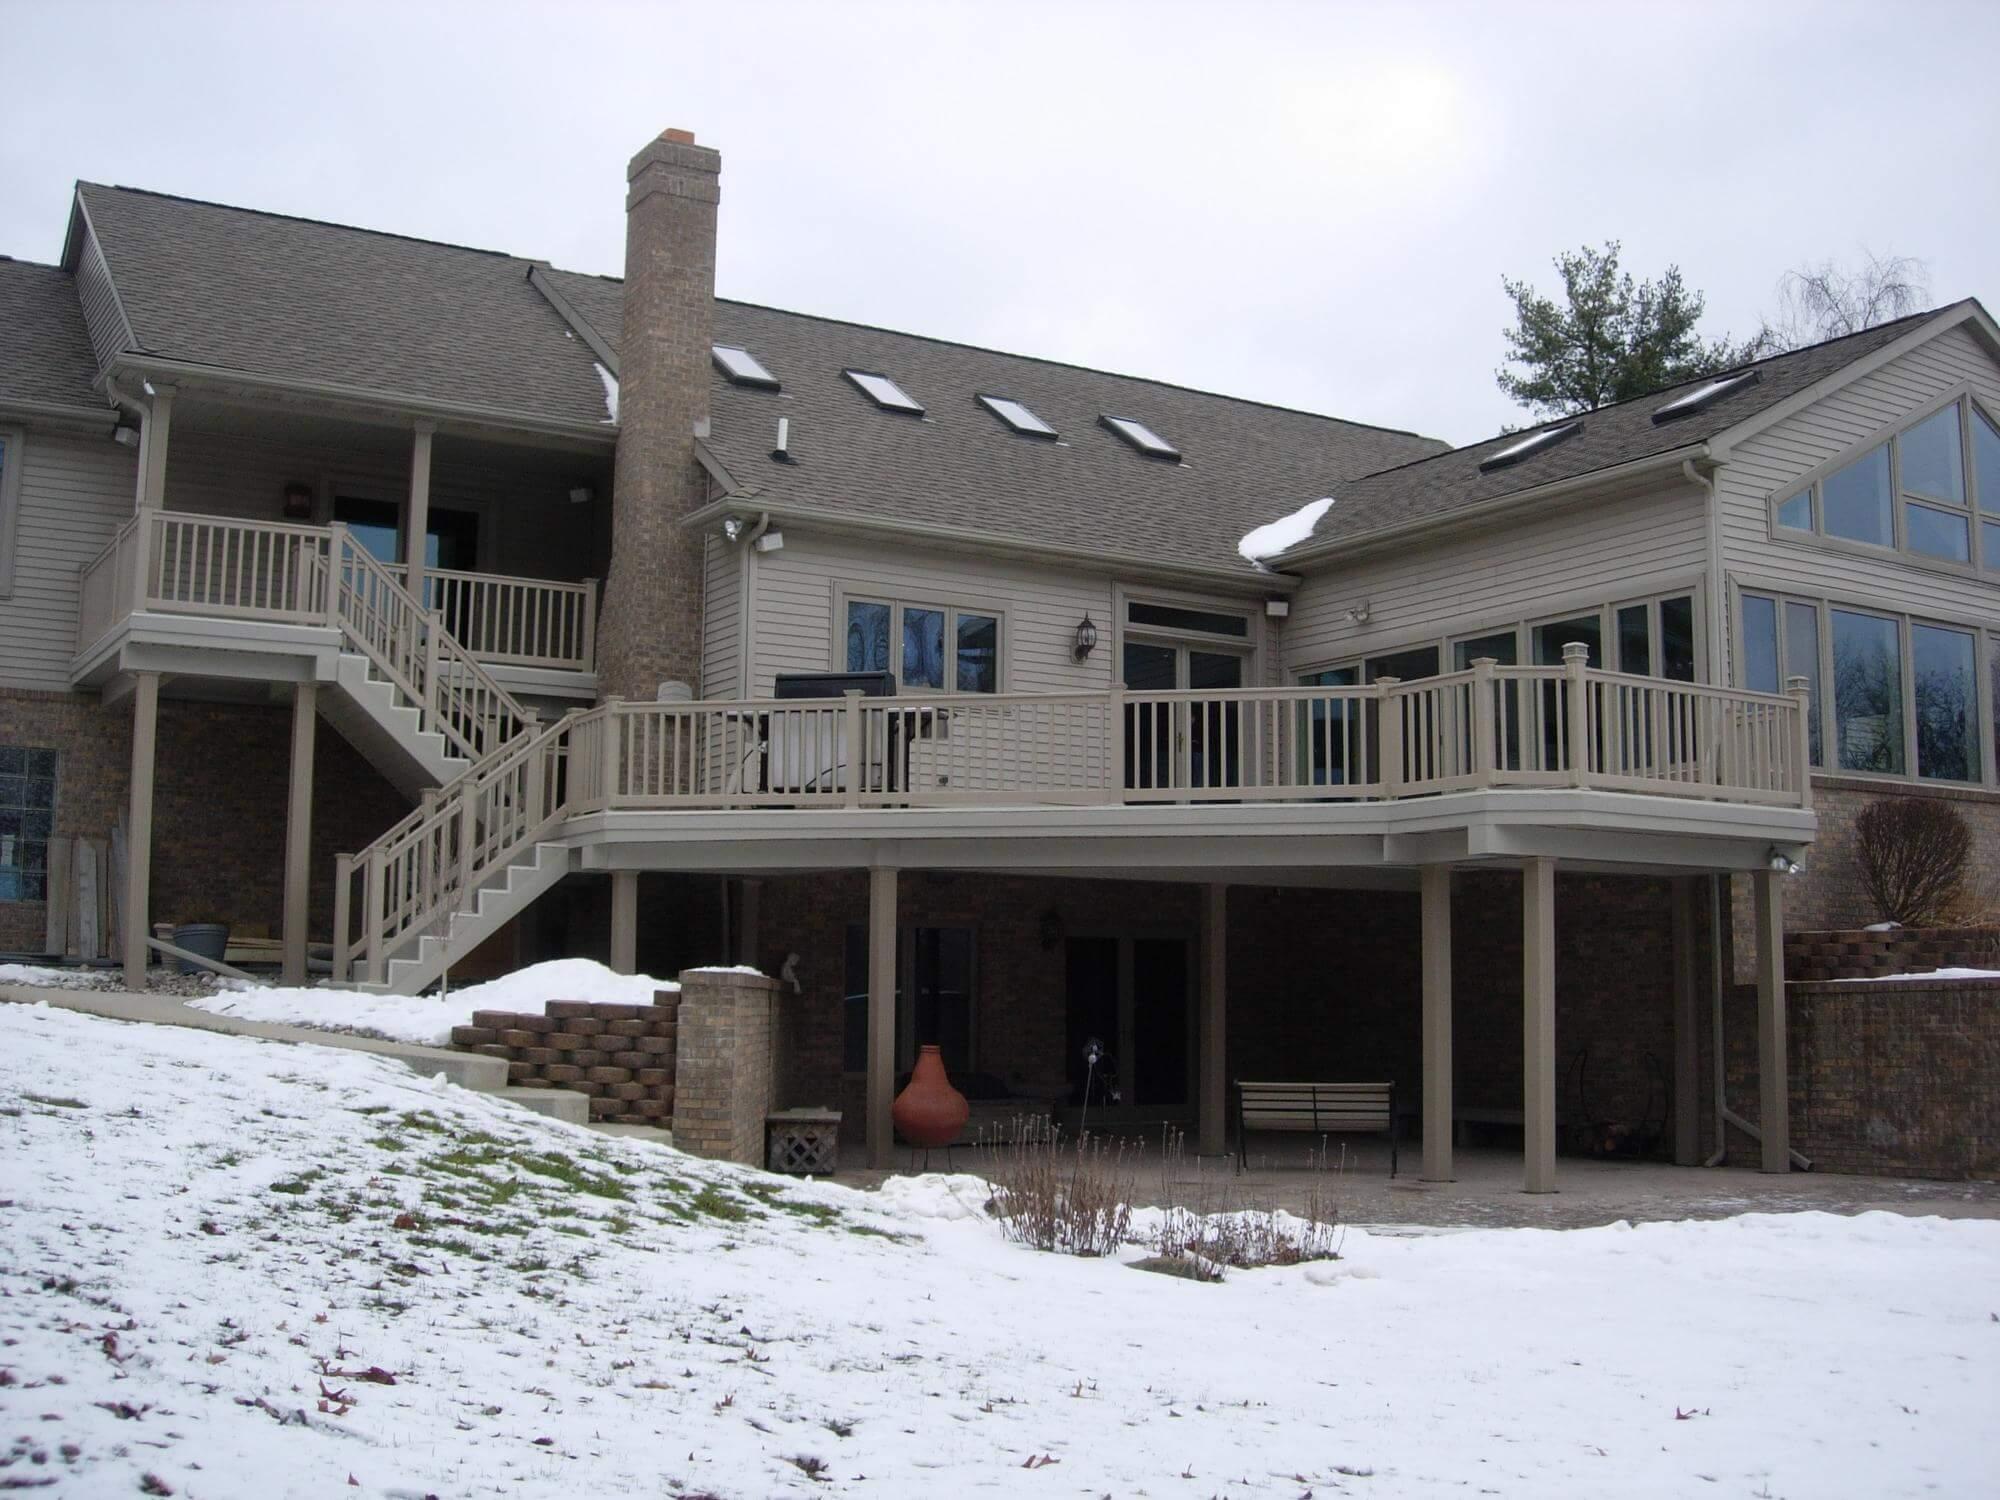 wahoo aluminum decks on a house with wahoo rail